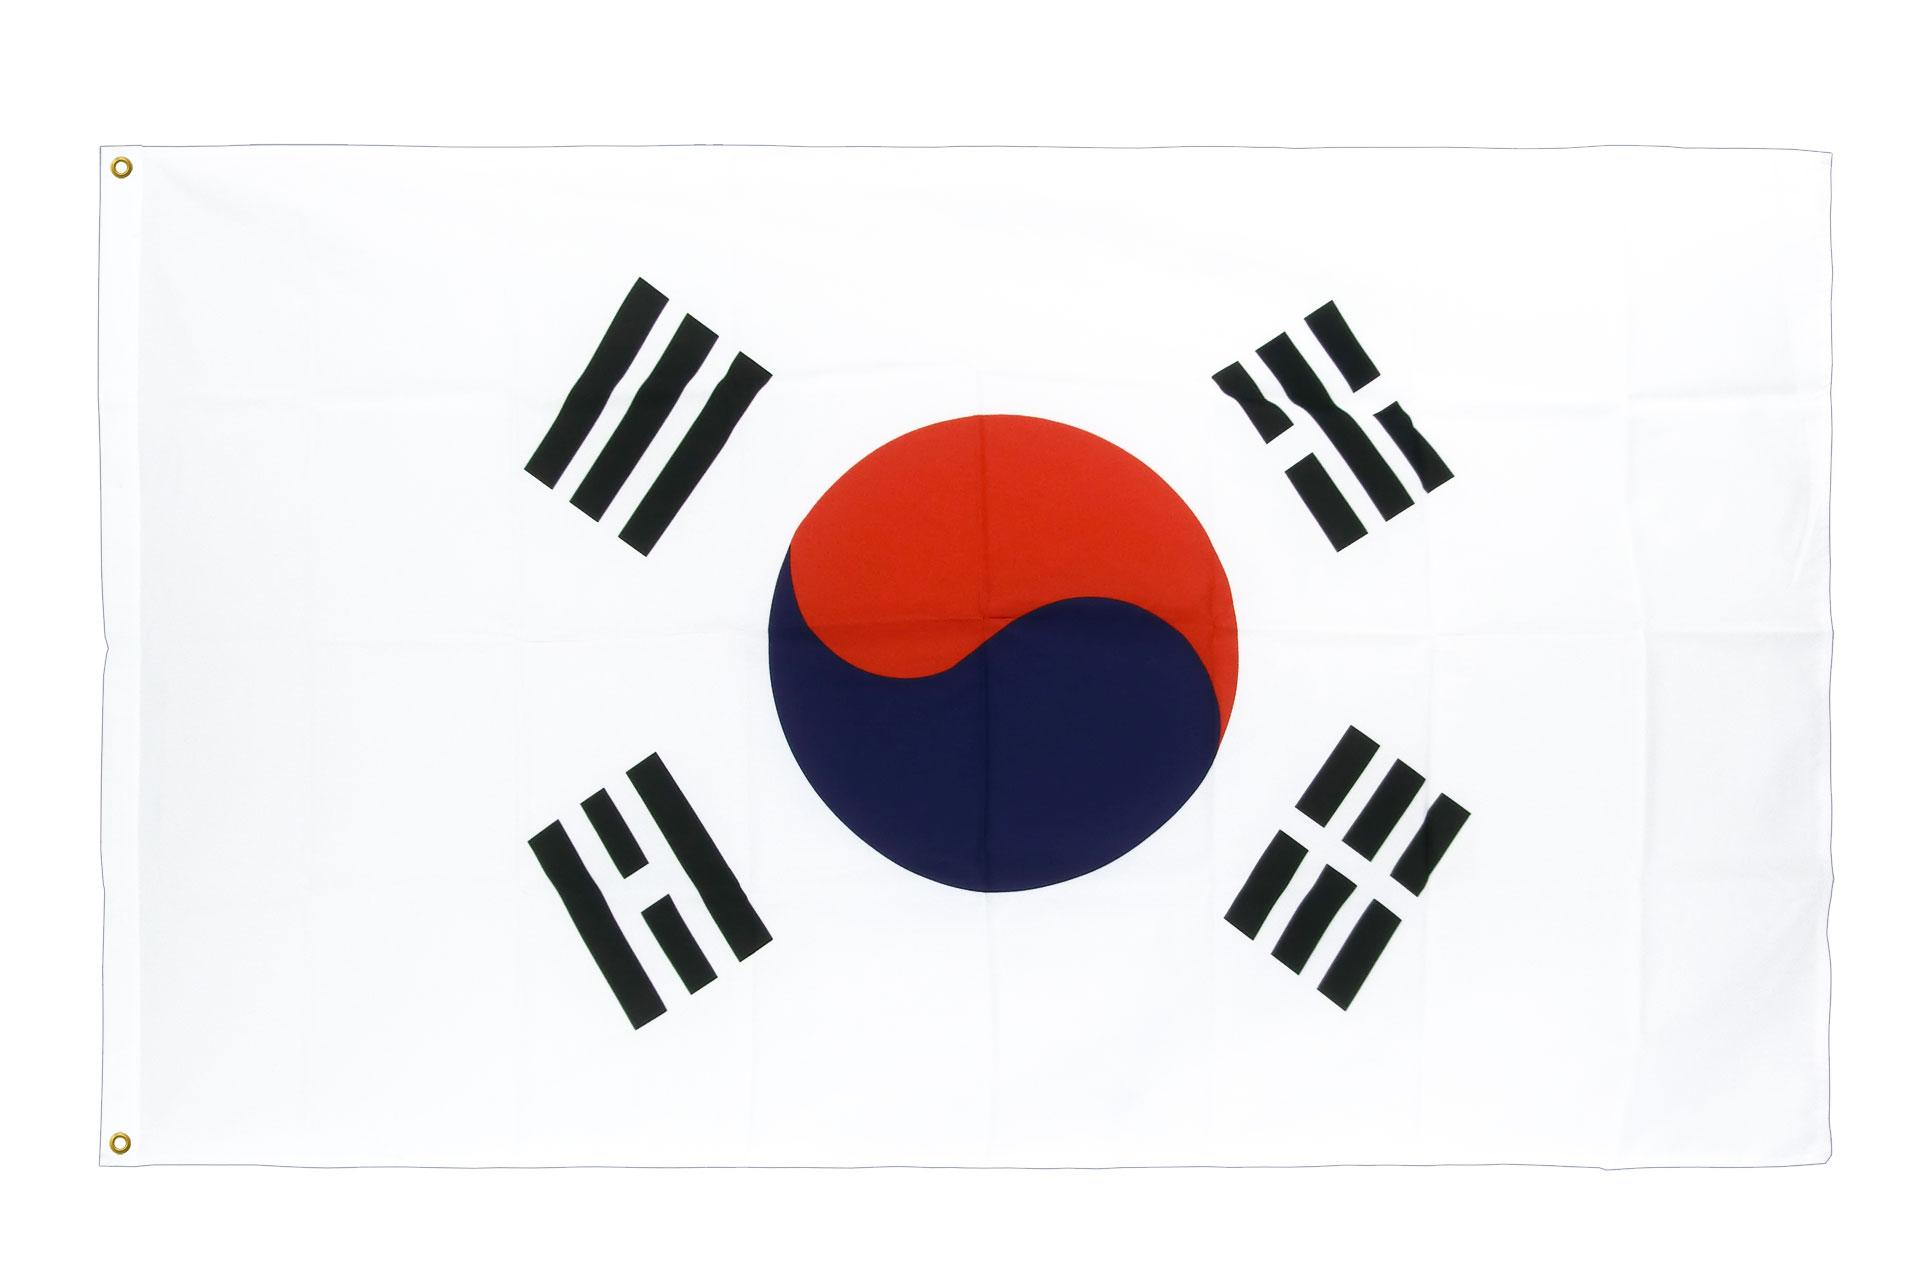 drapeau de qualit u00e9   cor u00e9e du sud - 90 x 150 cm cv